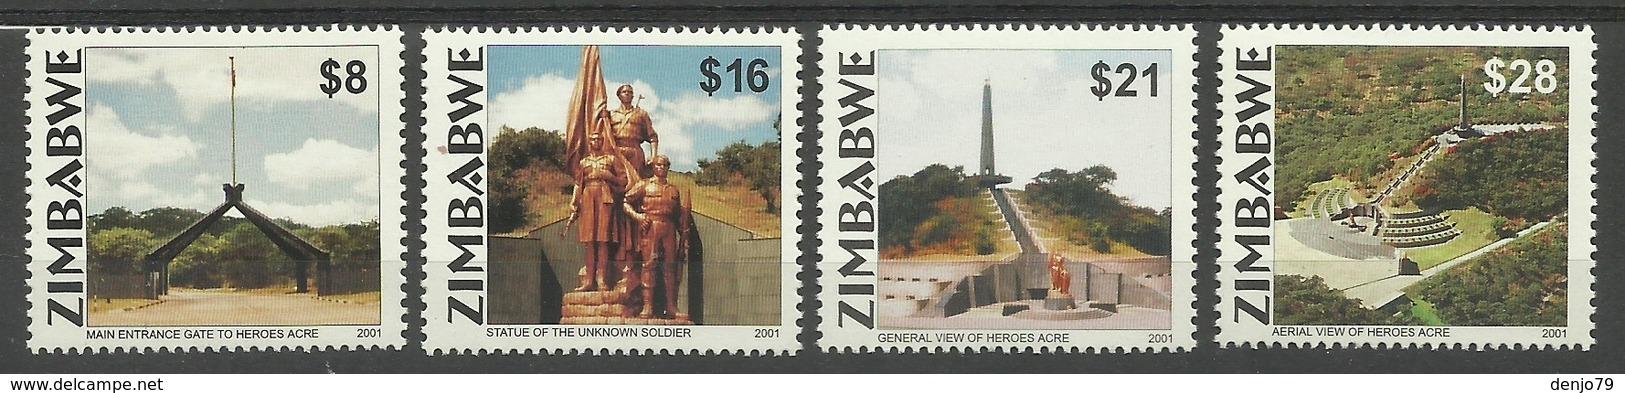 ZIMBABWE  2001  INDEPENDENCE ANNIVERSARY,HEROES ACRE SET MNH - Zimbabwe (1980-...)